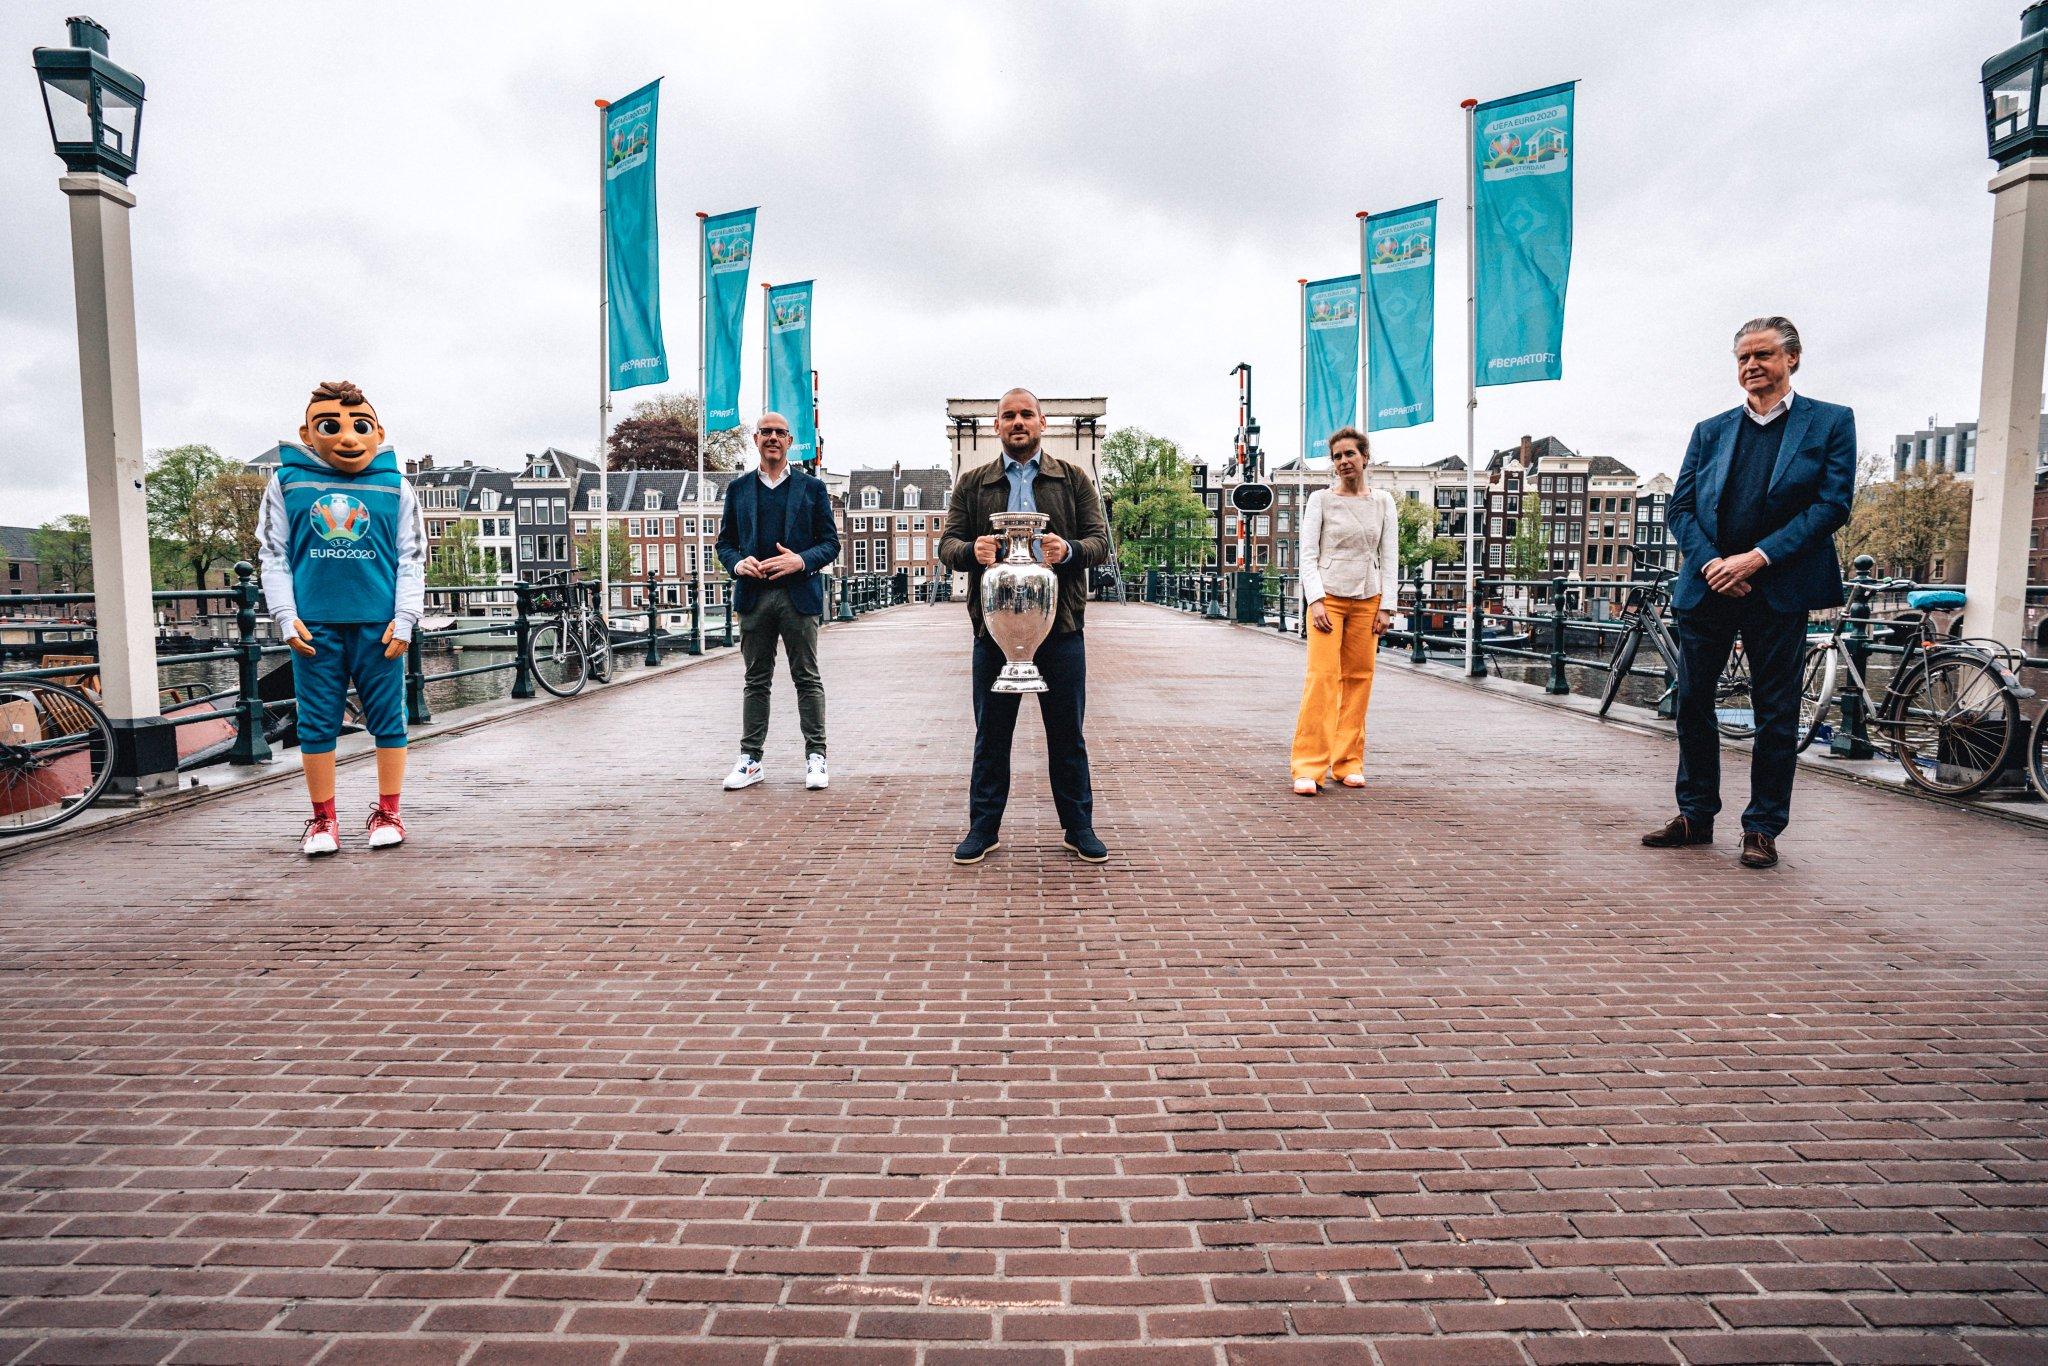 "UEFA EURO 2020 on Twitter: ""🇳🇱 Amsterdam welcomes the EURO trophy 🏆 #EUROTrophyTour #EURO2020… """